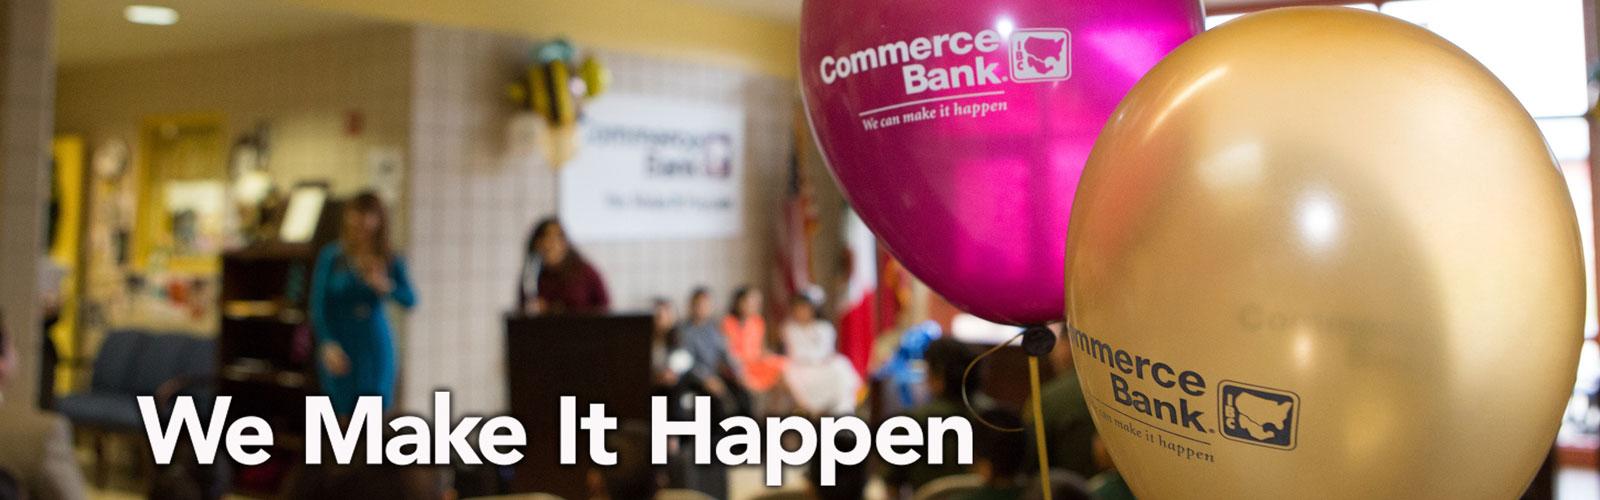 We Make it Happen Commerce Bank